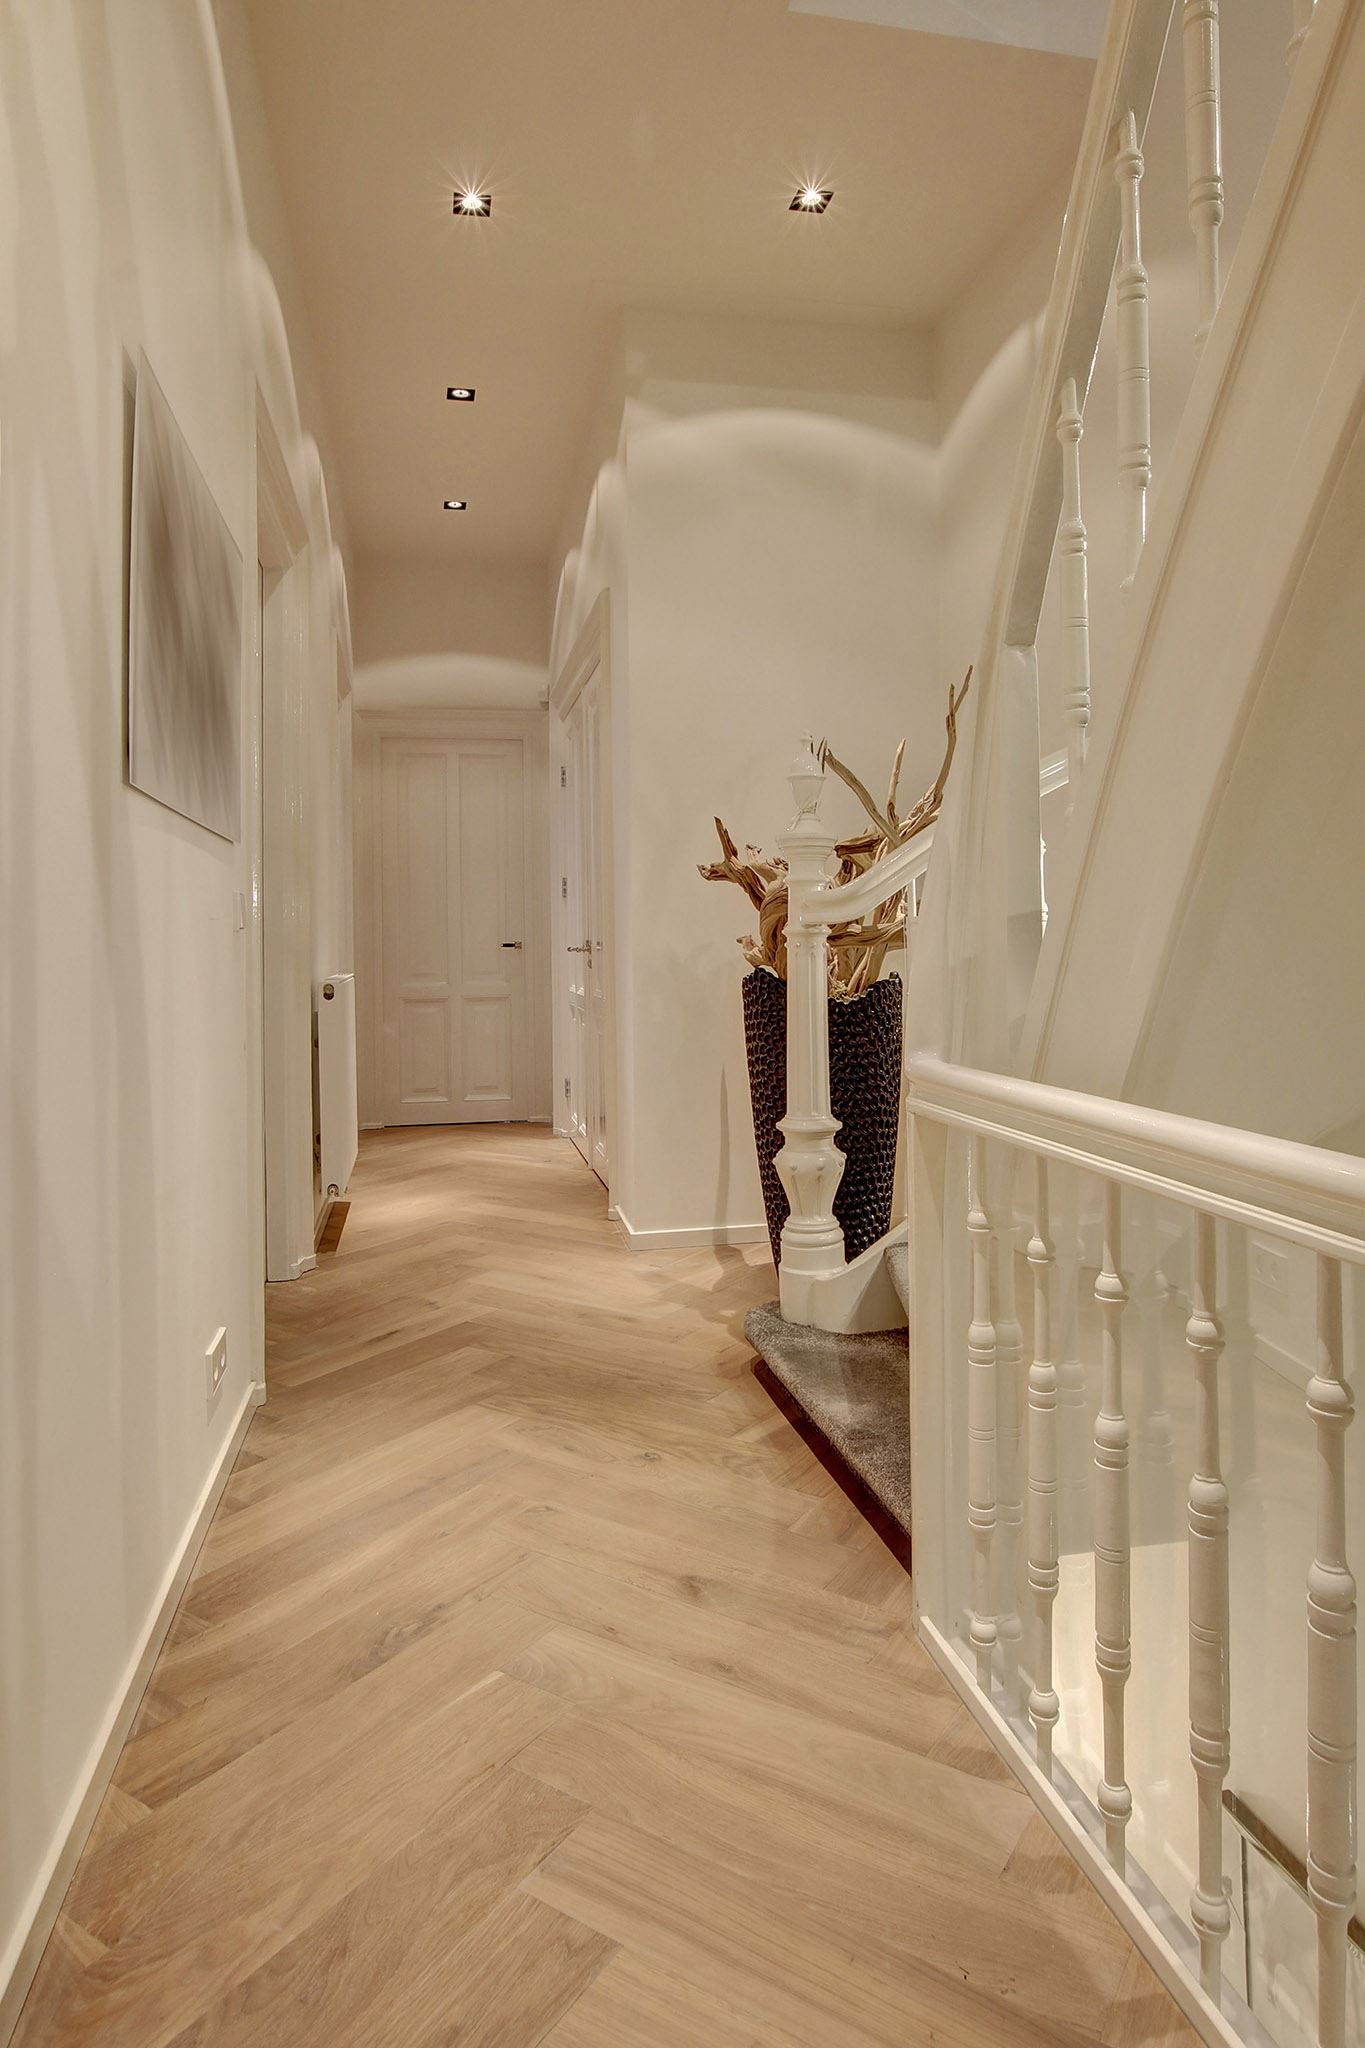 коридор паркет елочка лестница двери